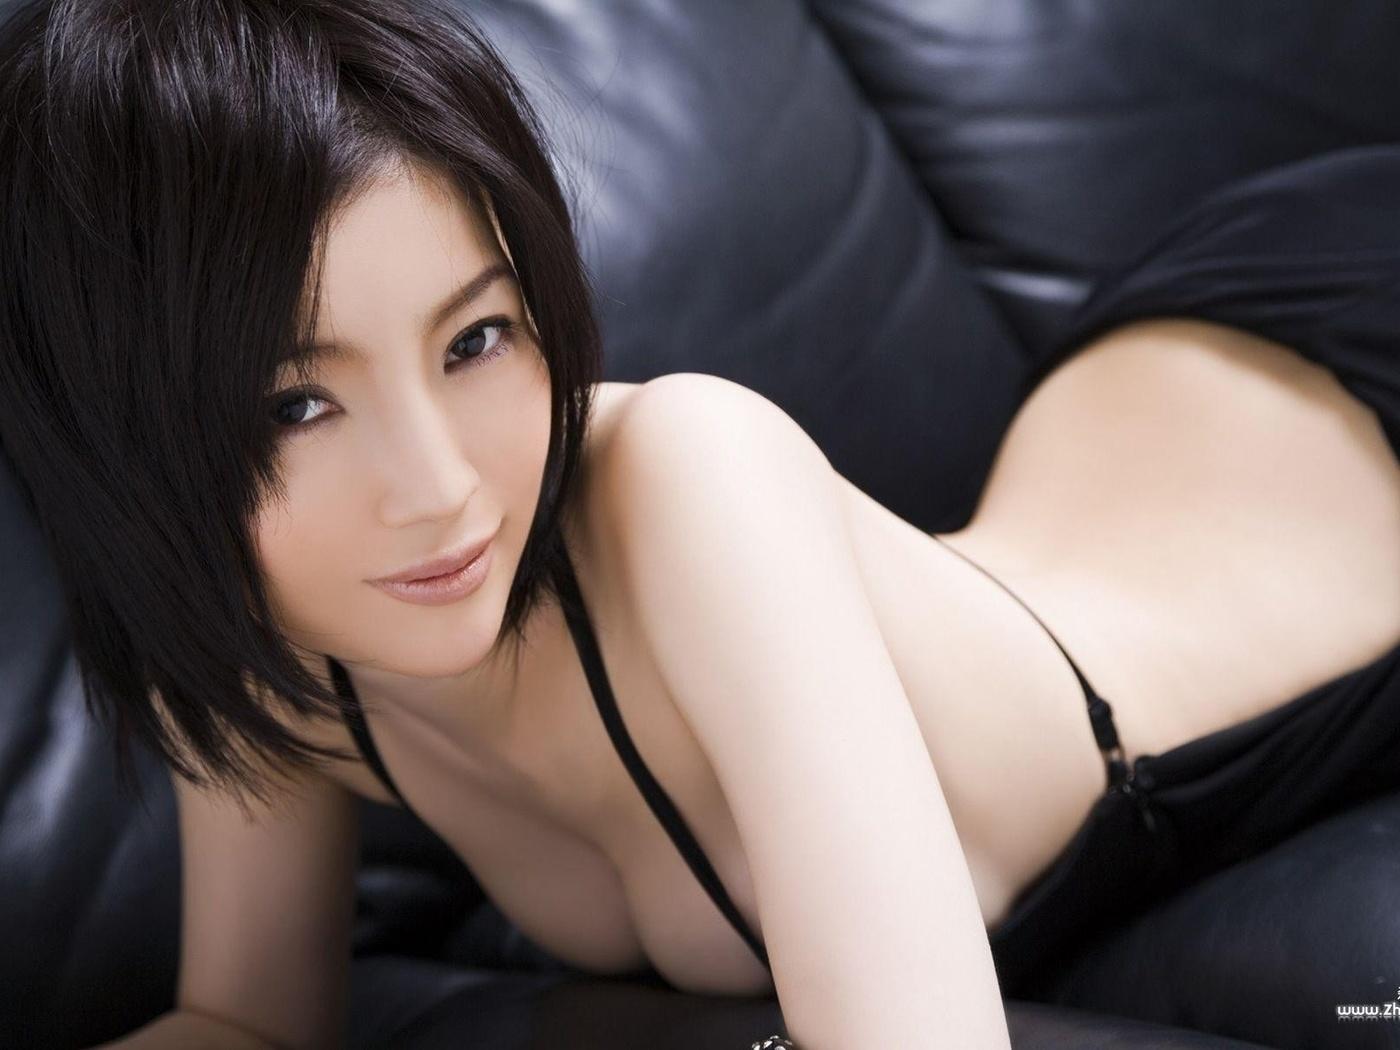 Nude walter barbara streisand